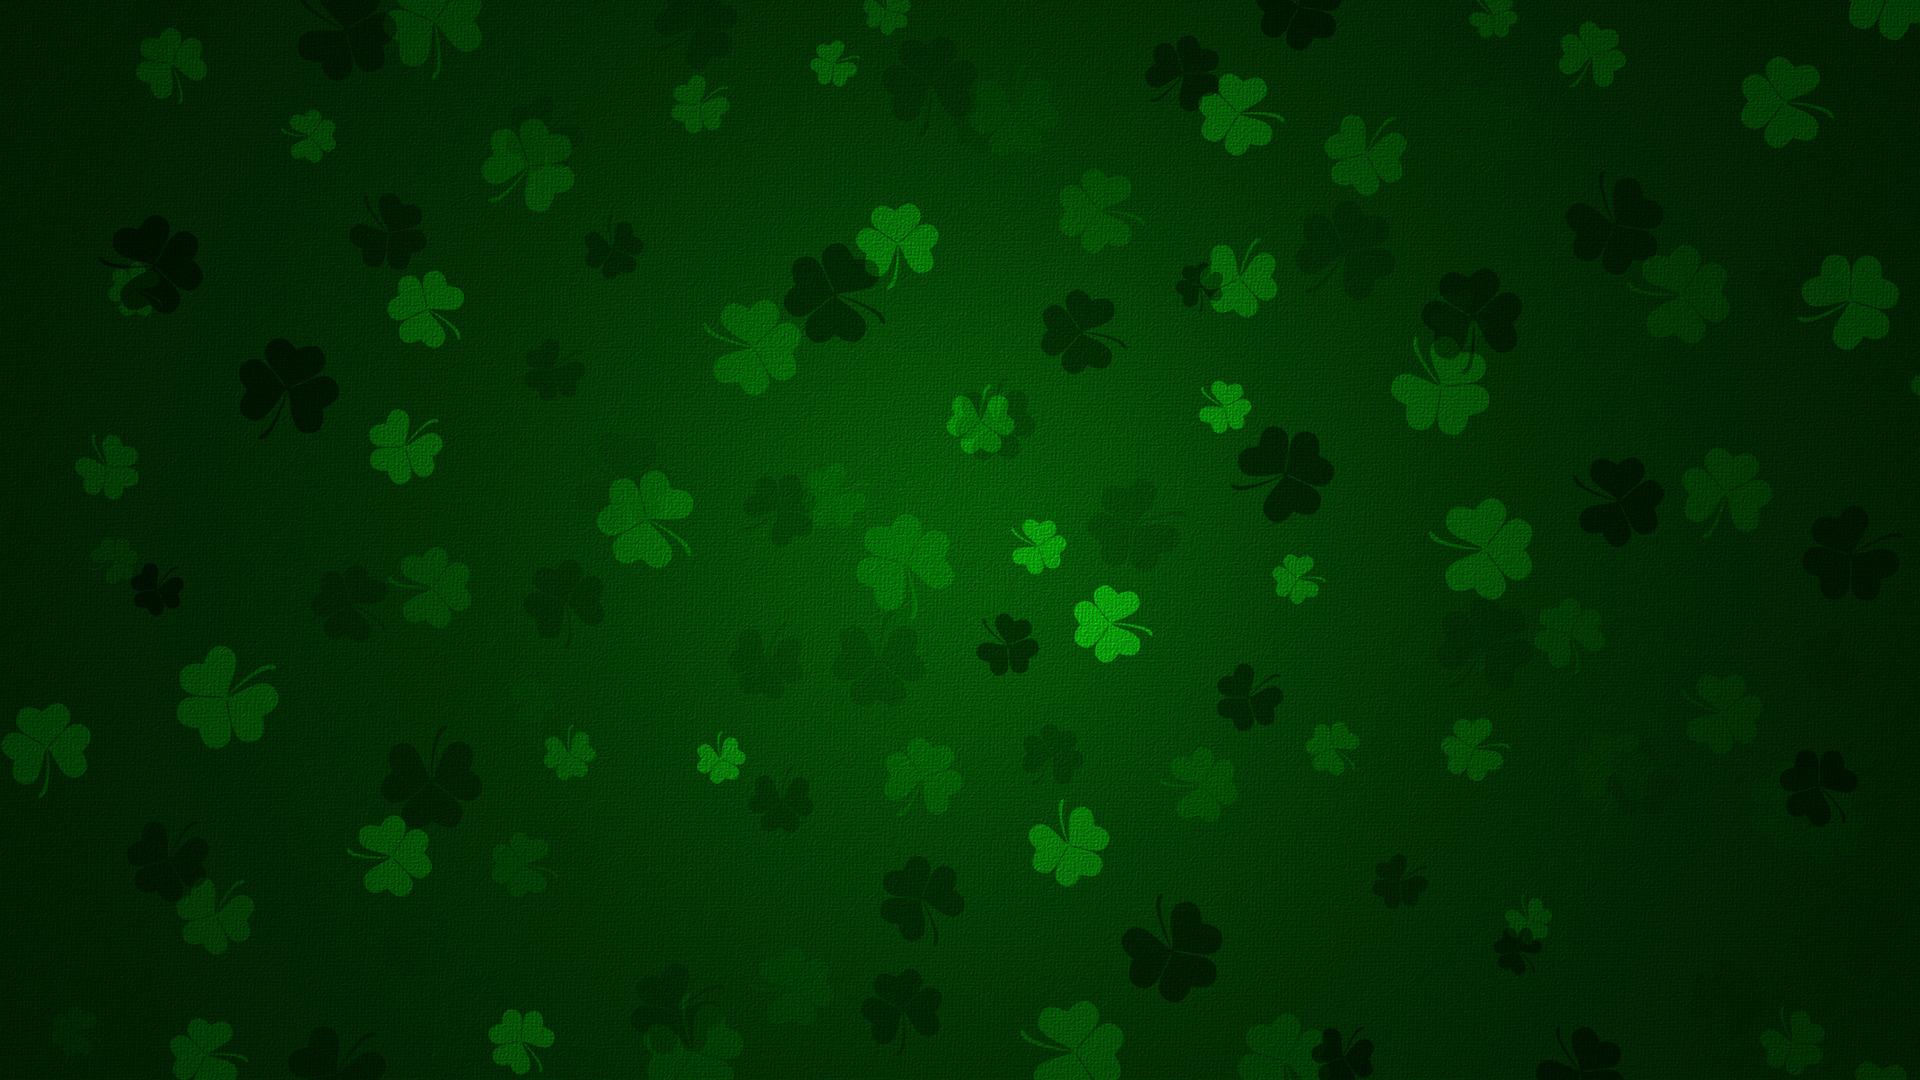 Happy Saint Patricks Day   Happy ST Patricks Day My Fans 1920x1080